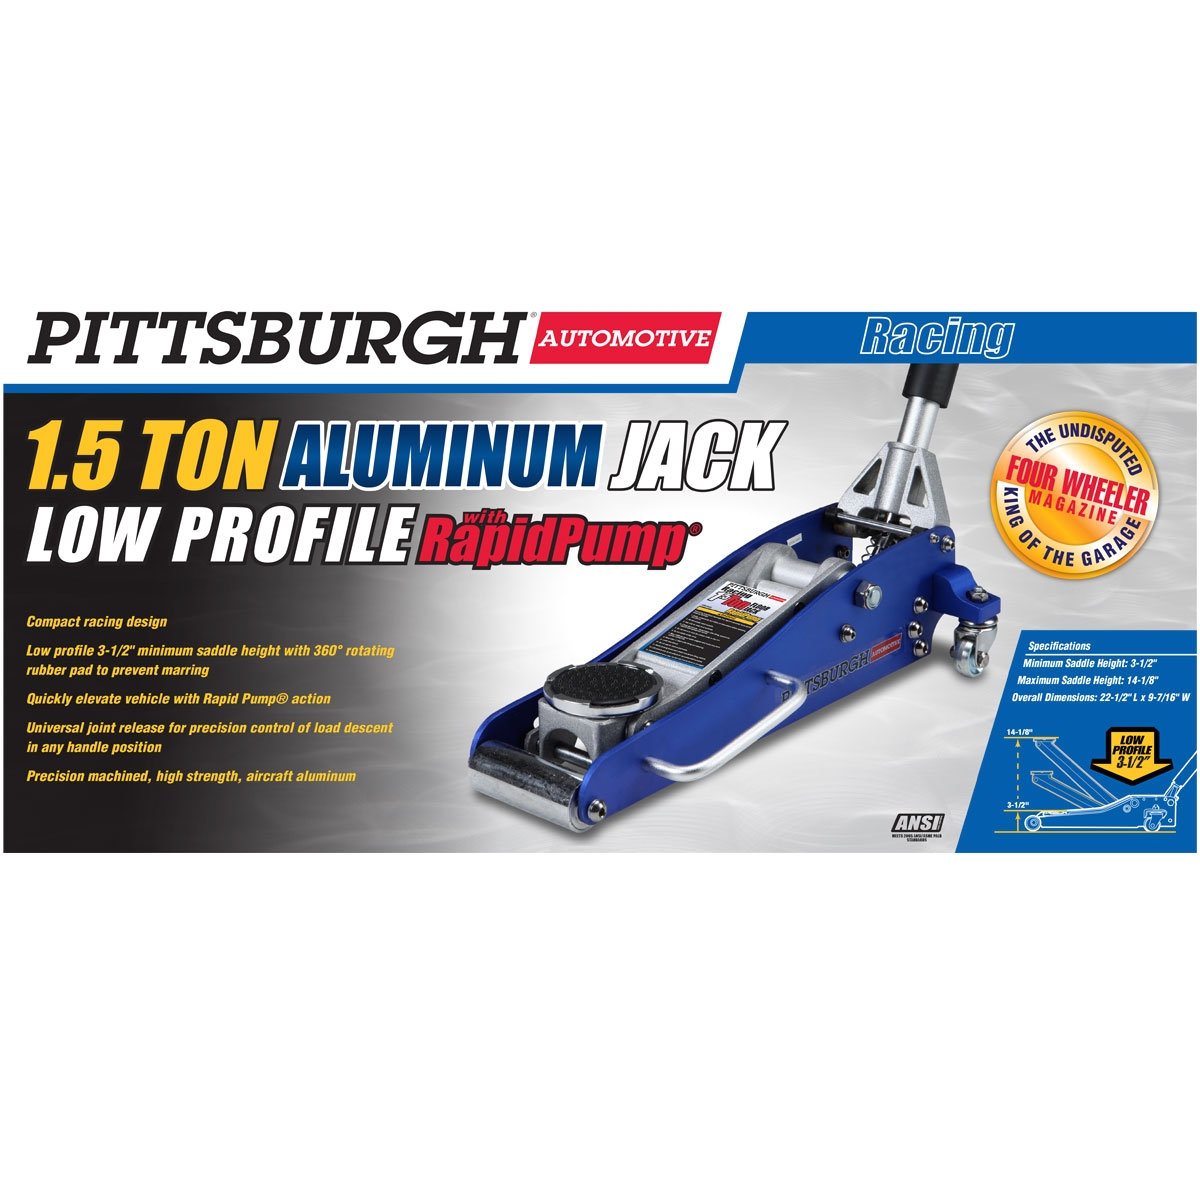 Aluminum High Lift Floor Jack 1 5 ton Aluminum Racing Floor Jack with Rapid Pumpa